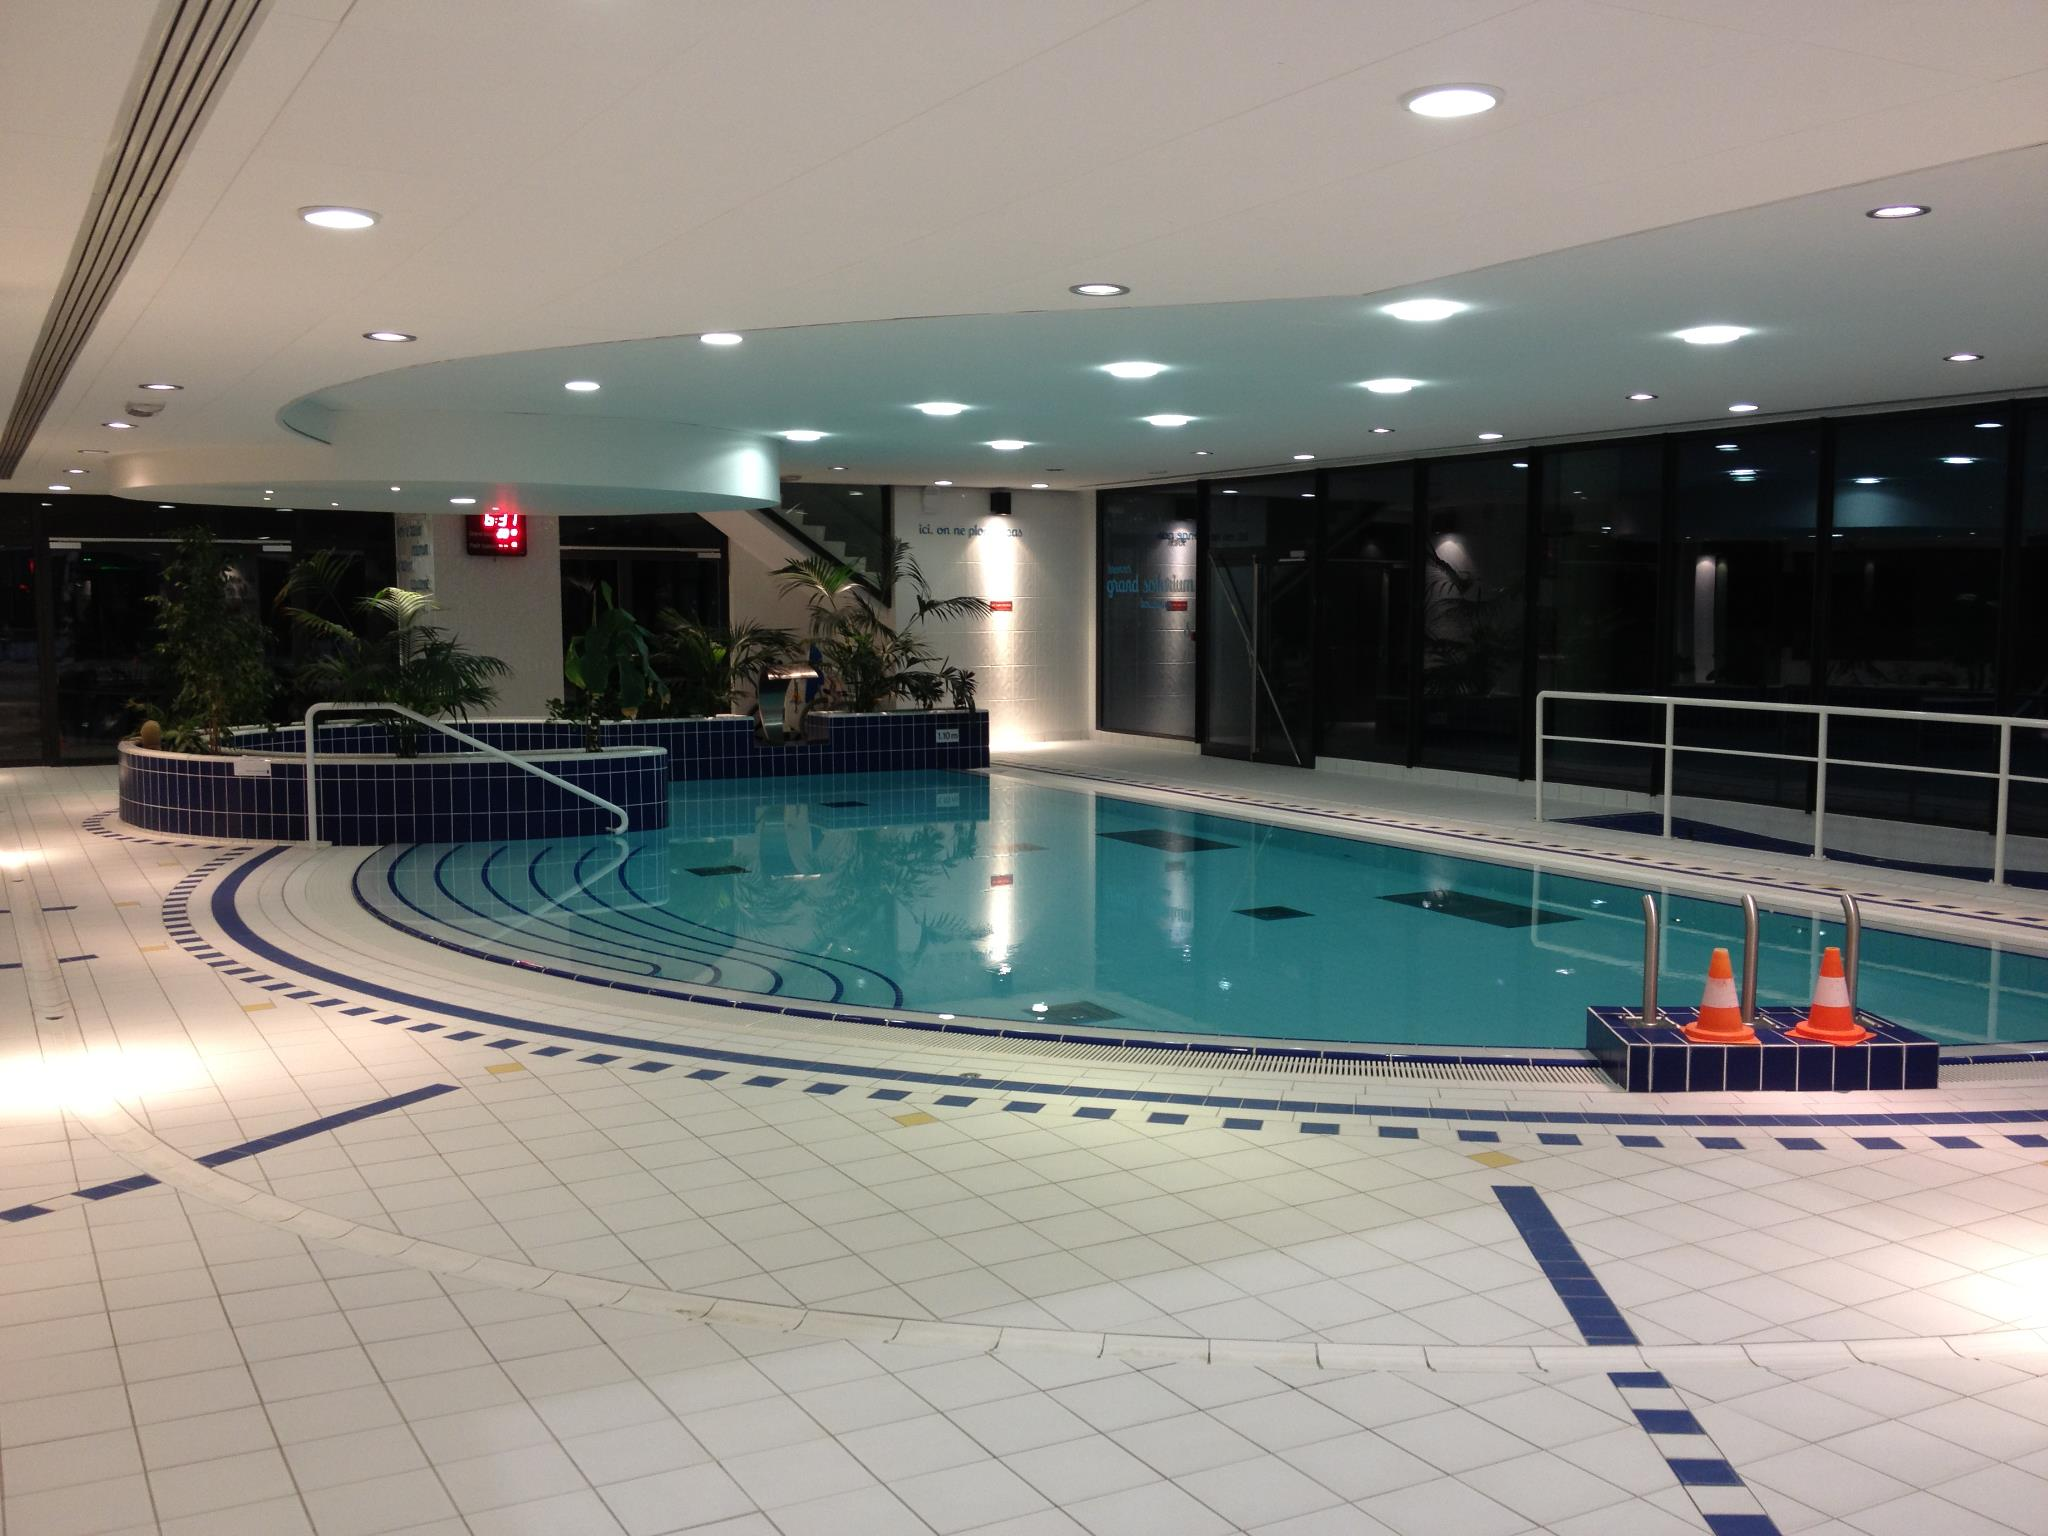 Centre Aquatique De Levallois Levallois Perret 15 Rue Raspail